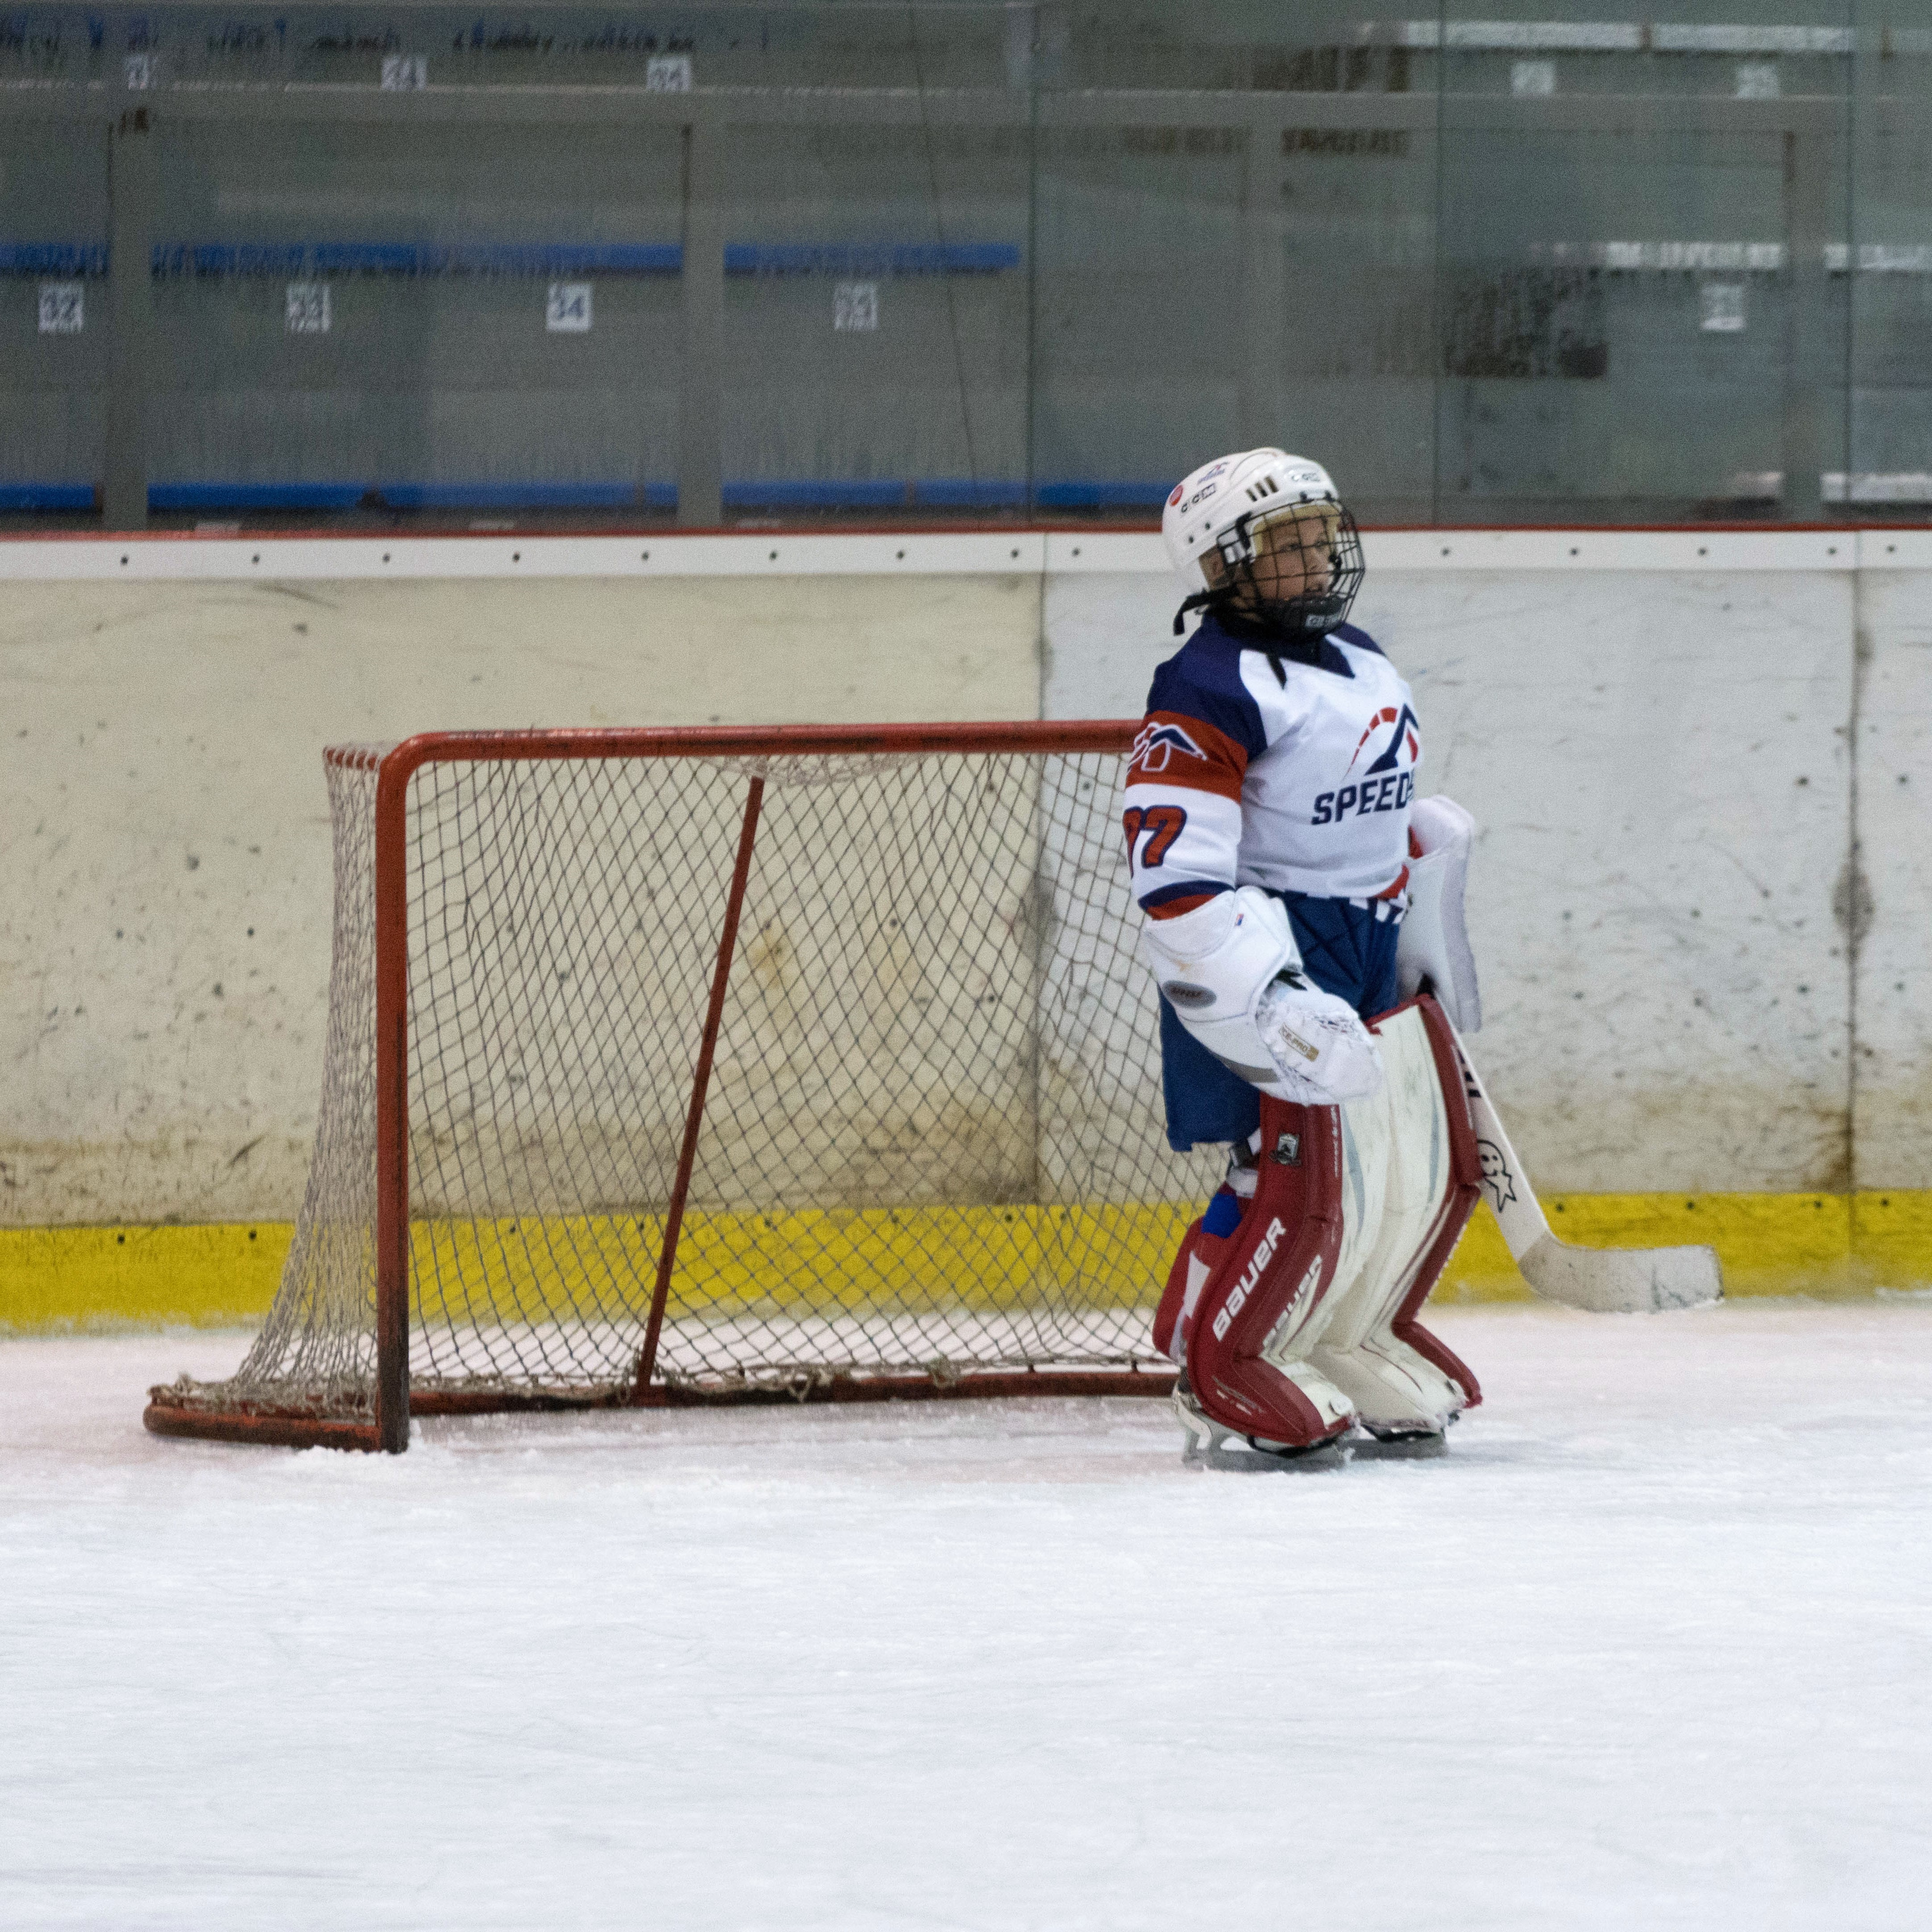 Speeders_sezona 2018_19 hokej turnaj lucenec 11